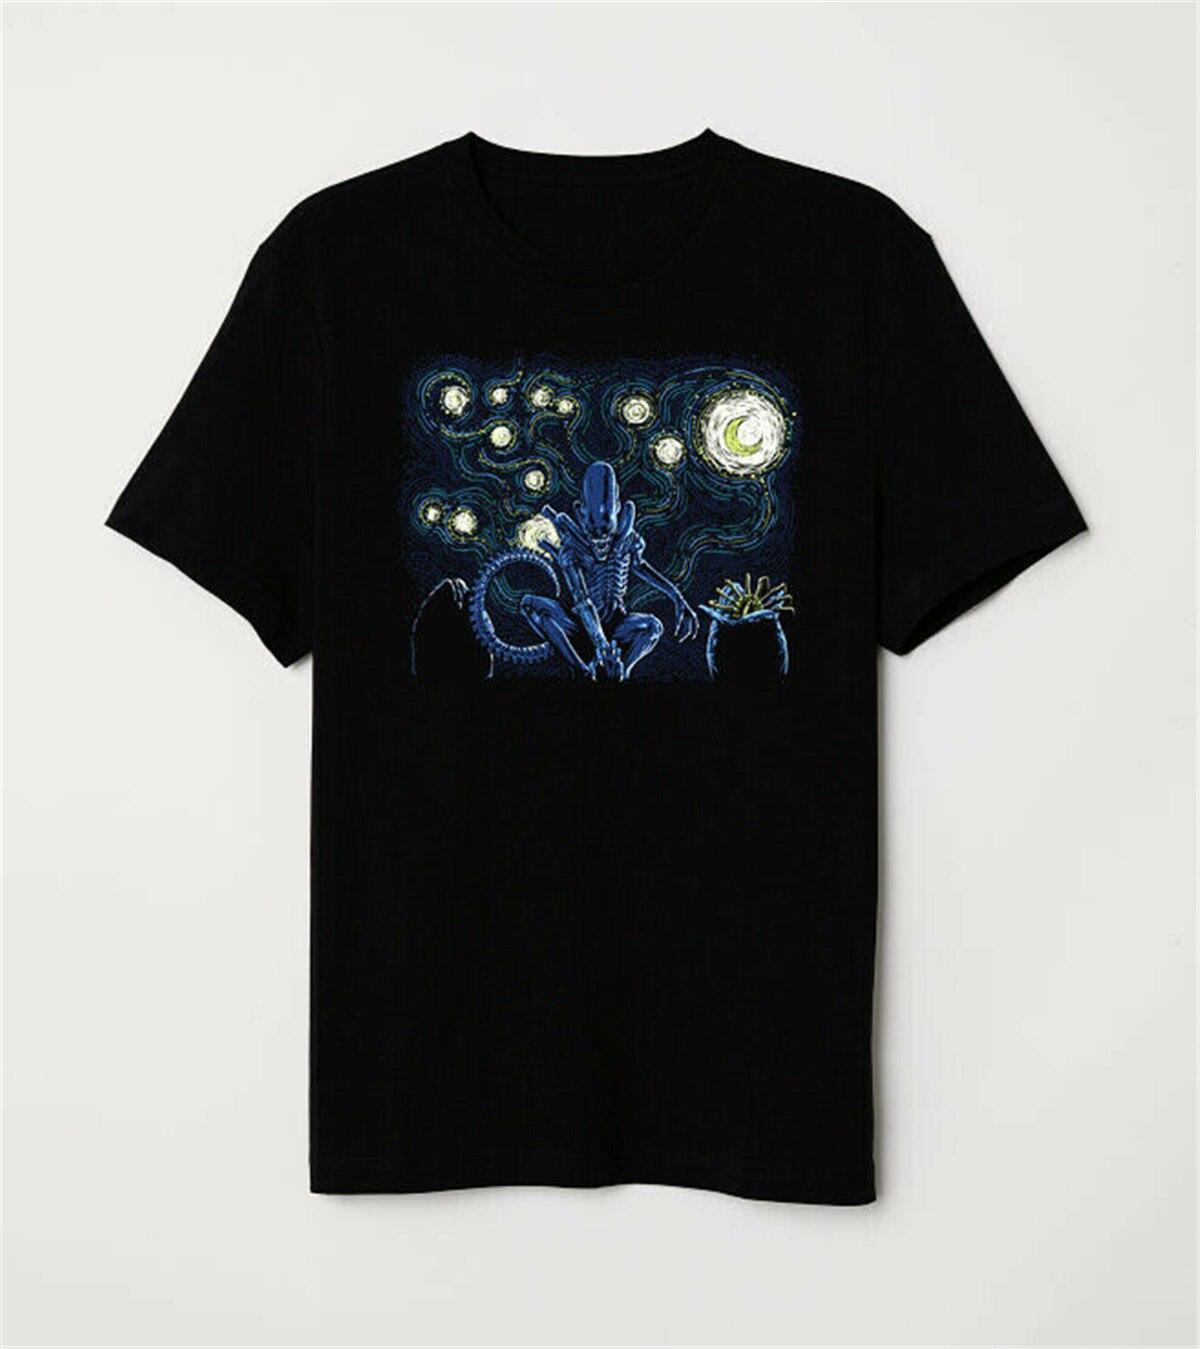 The Alien Monk Summer Basic Tees-Youth Short Sleeve Tee Short T Shirts